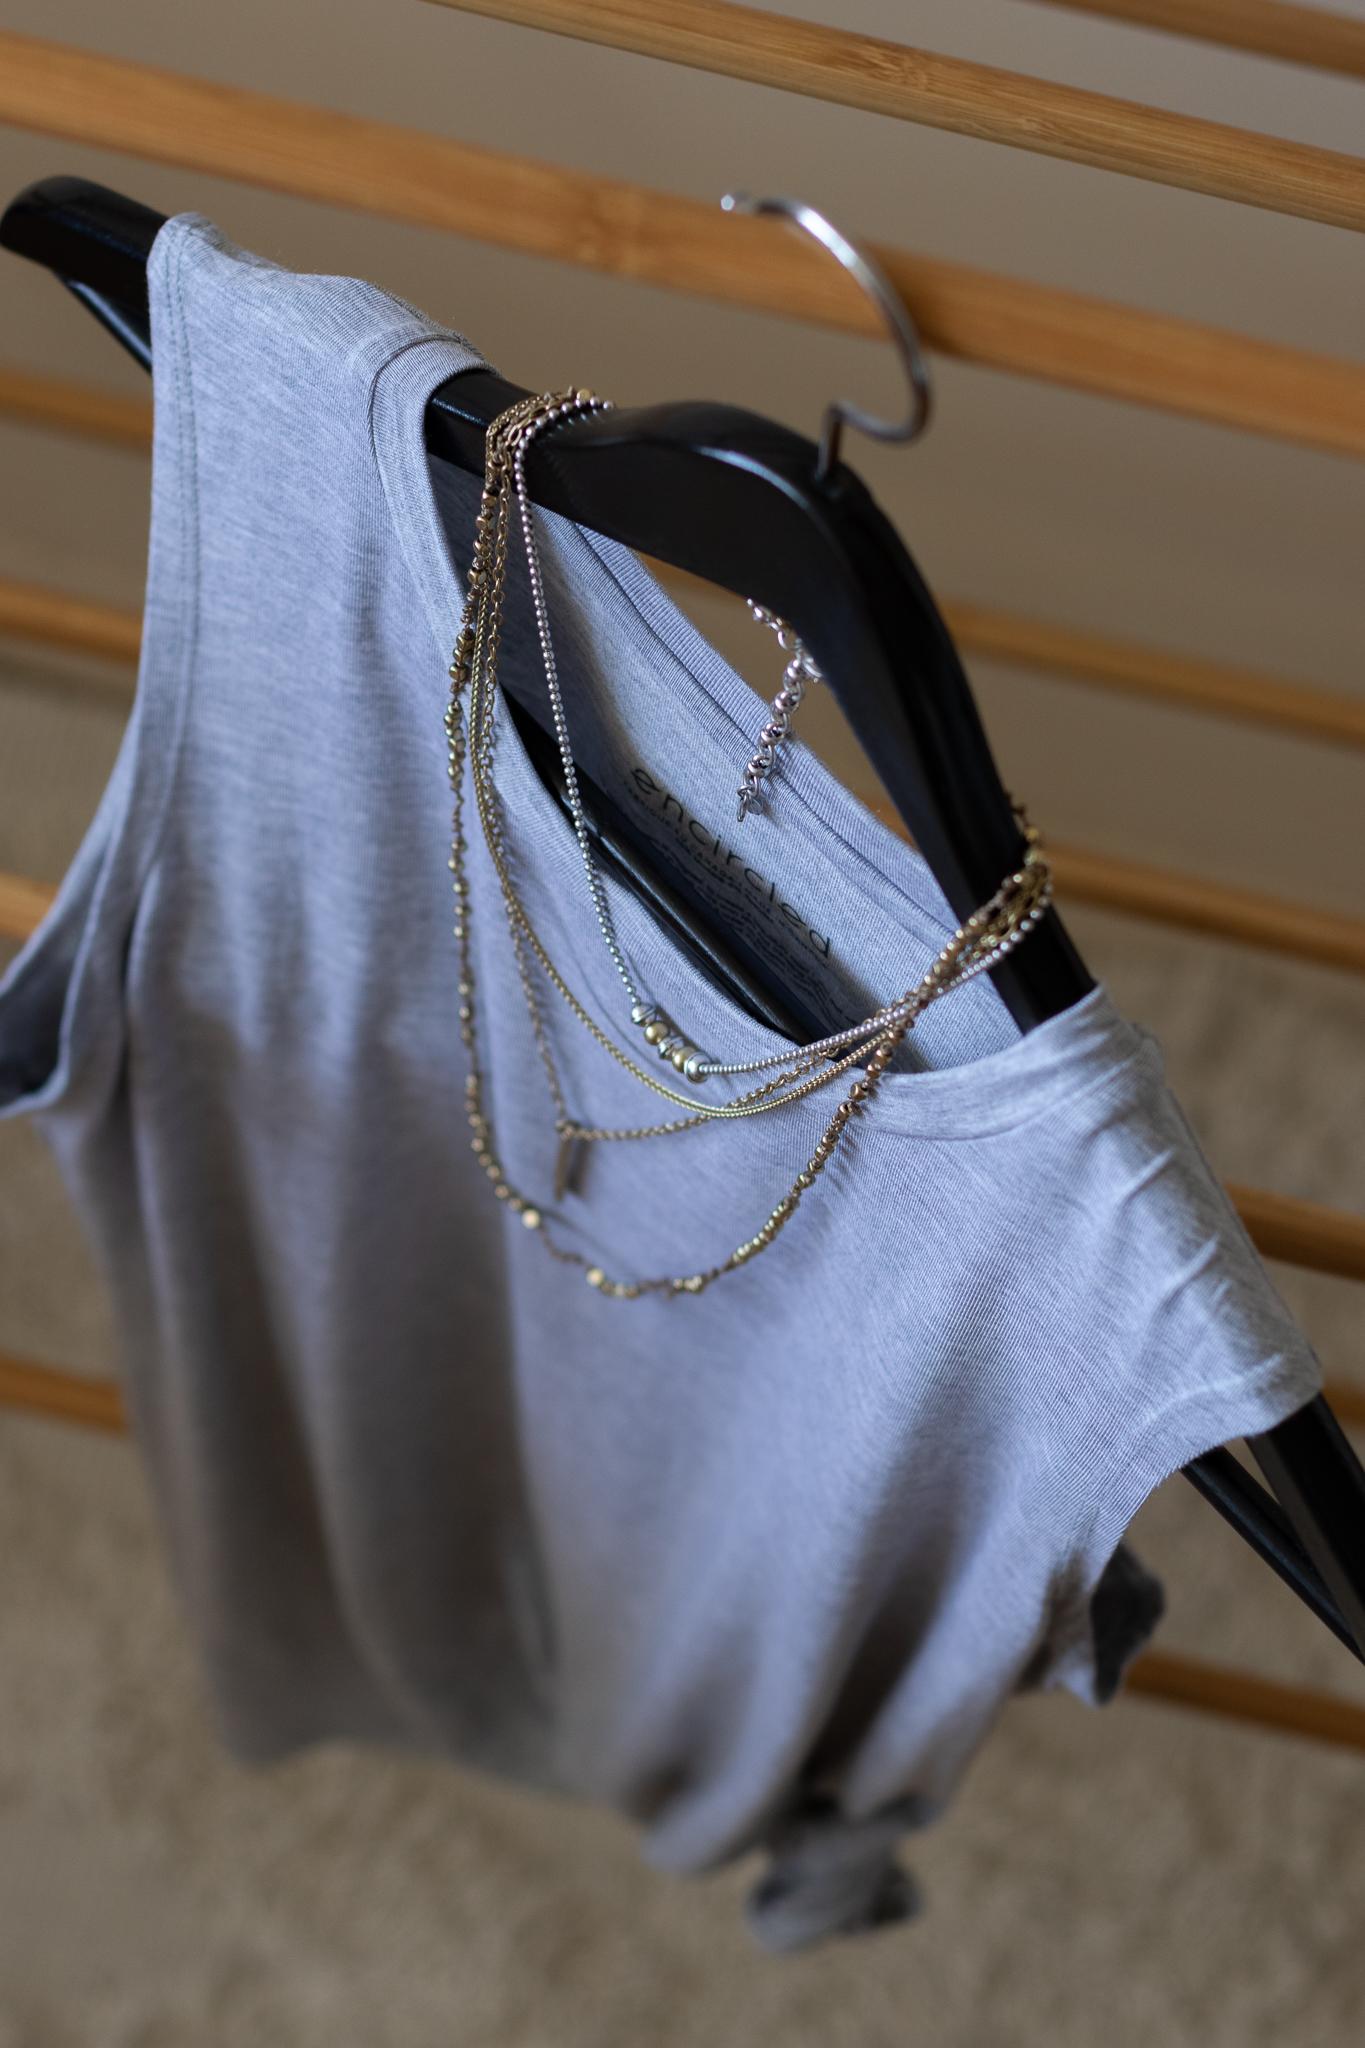 encircled_travel_clothing-4.JPG